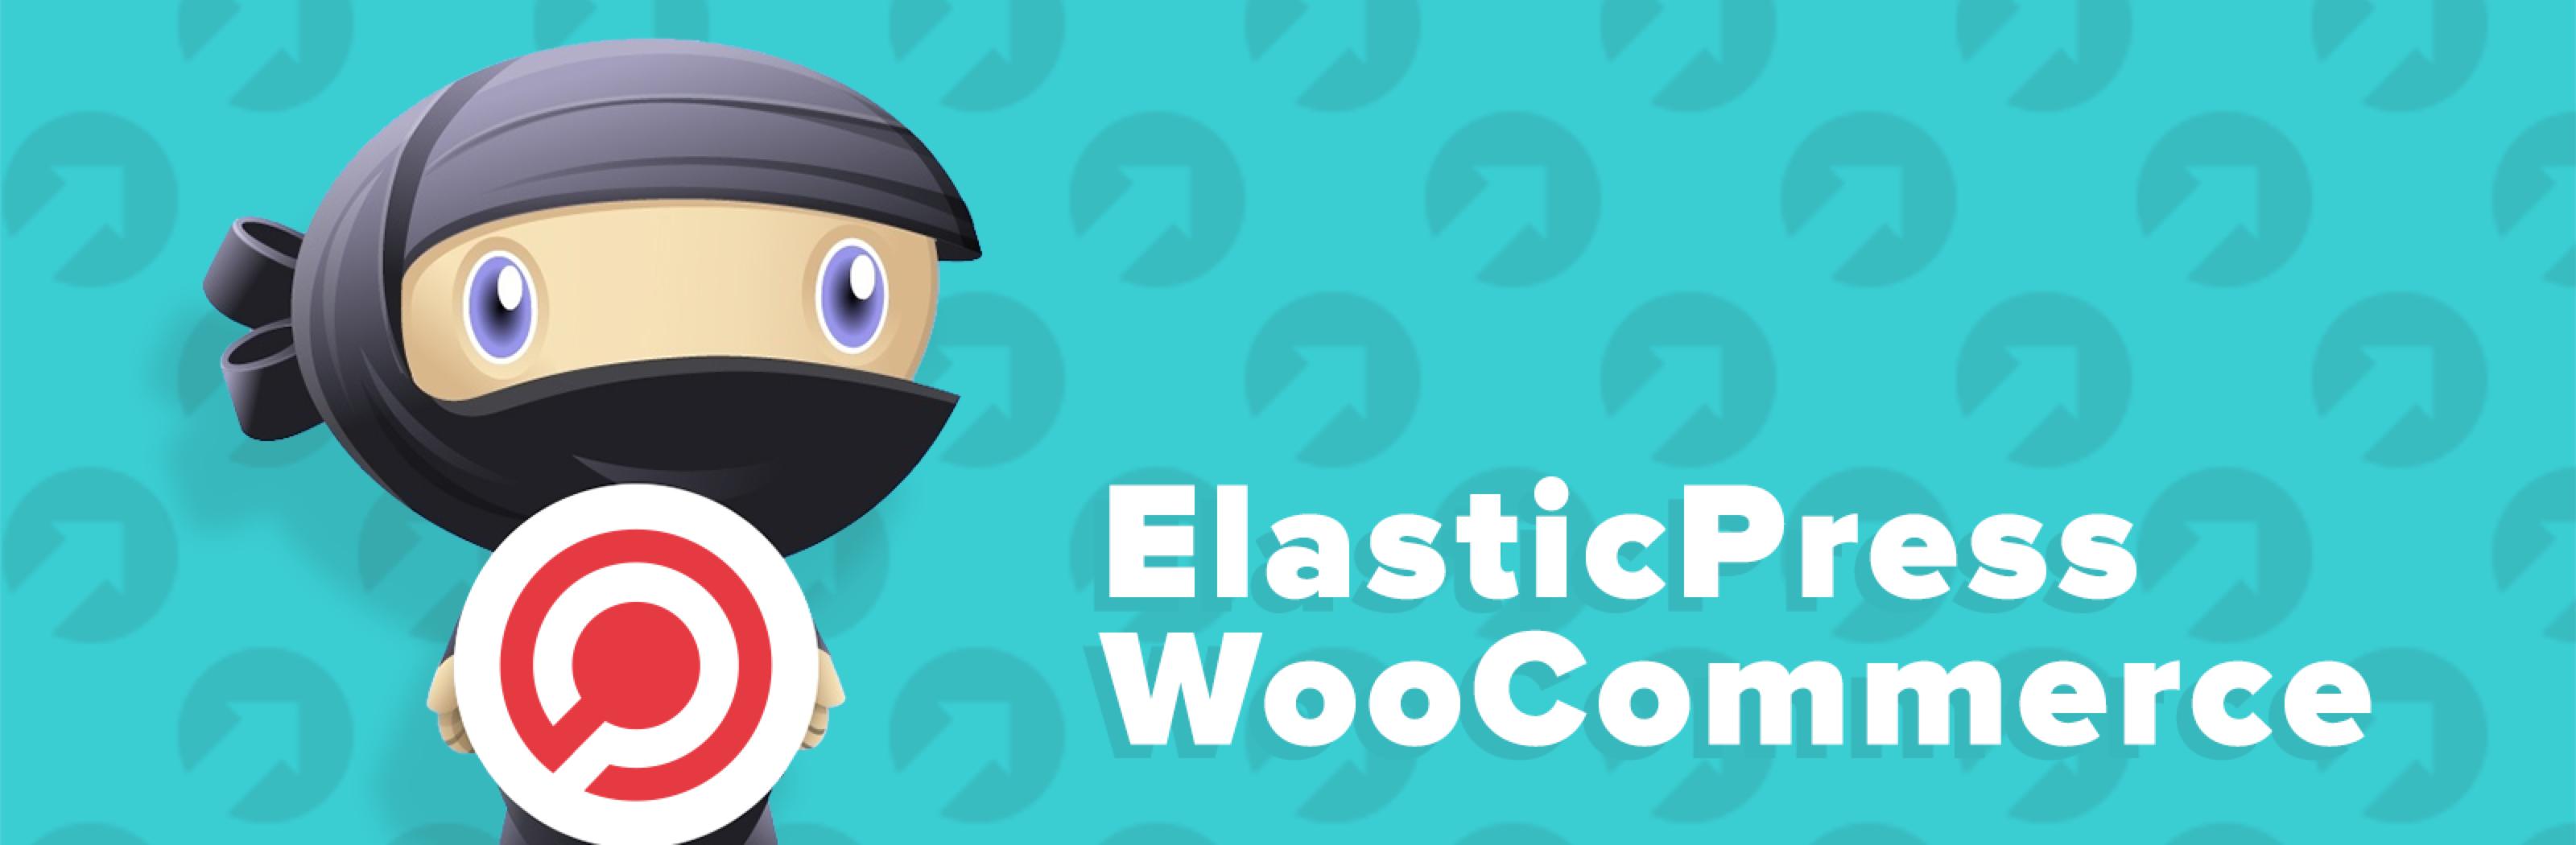 elasticpress-woocommerce